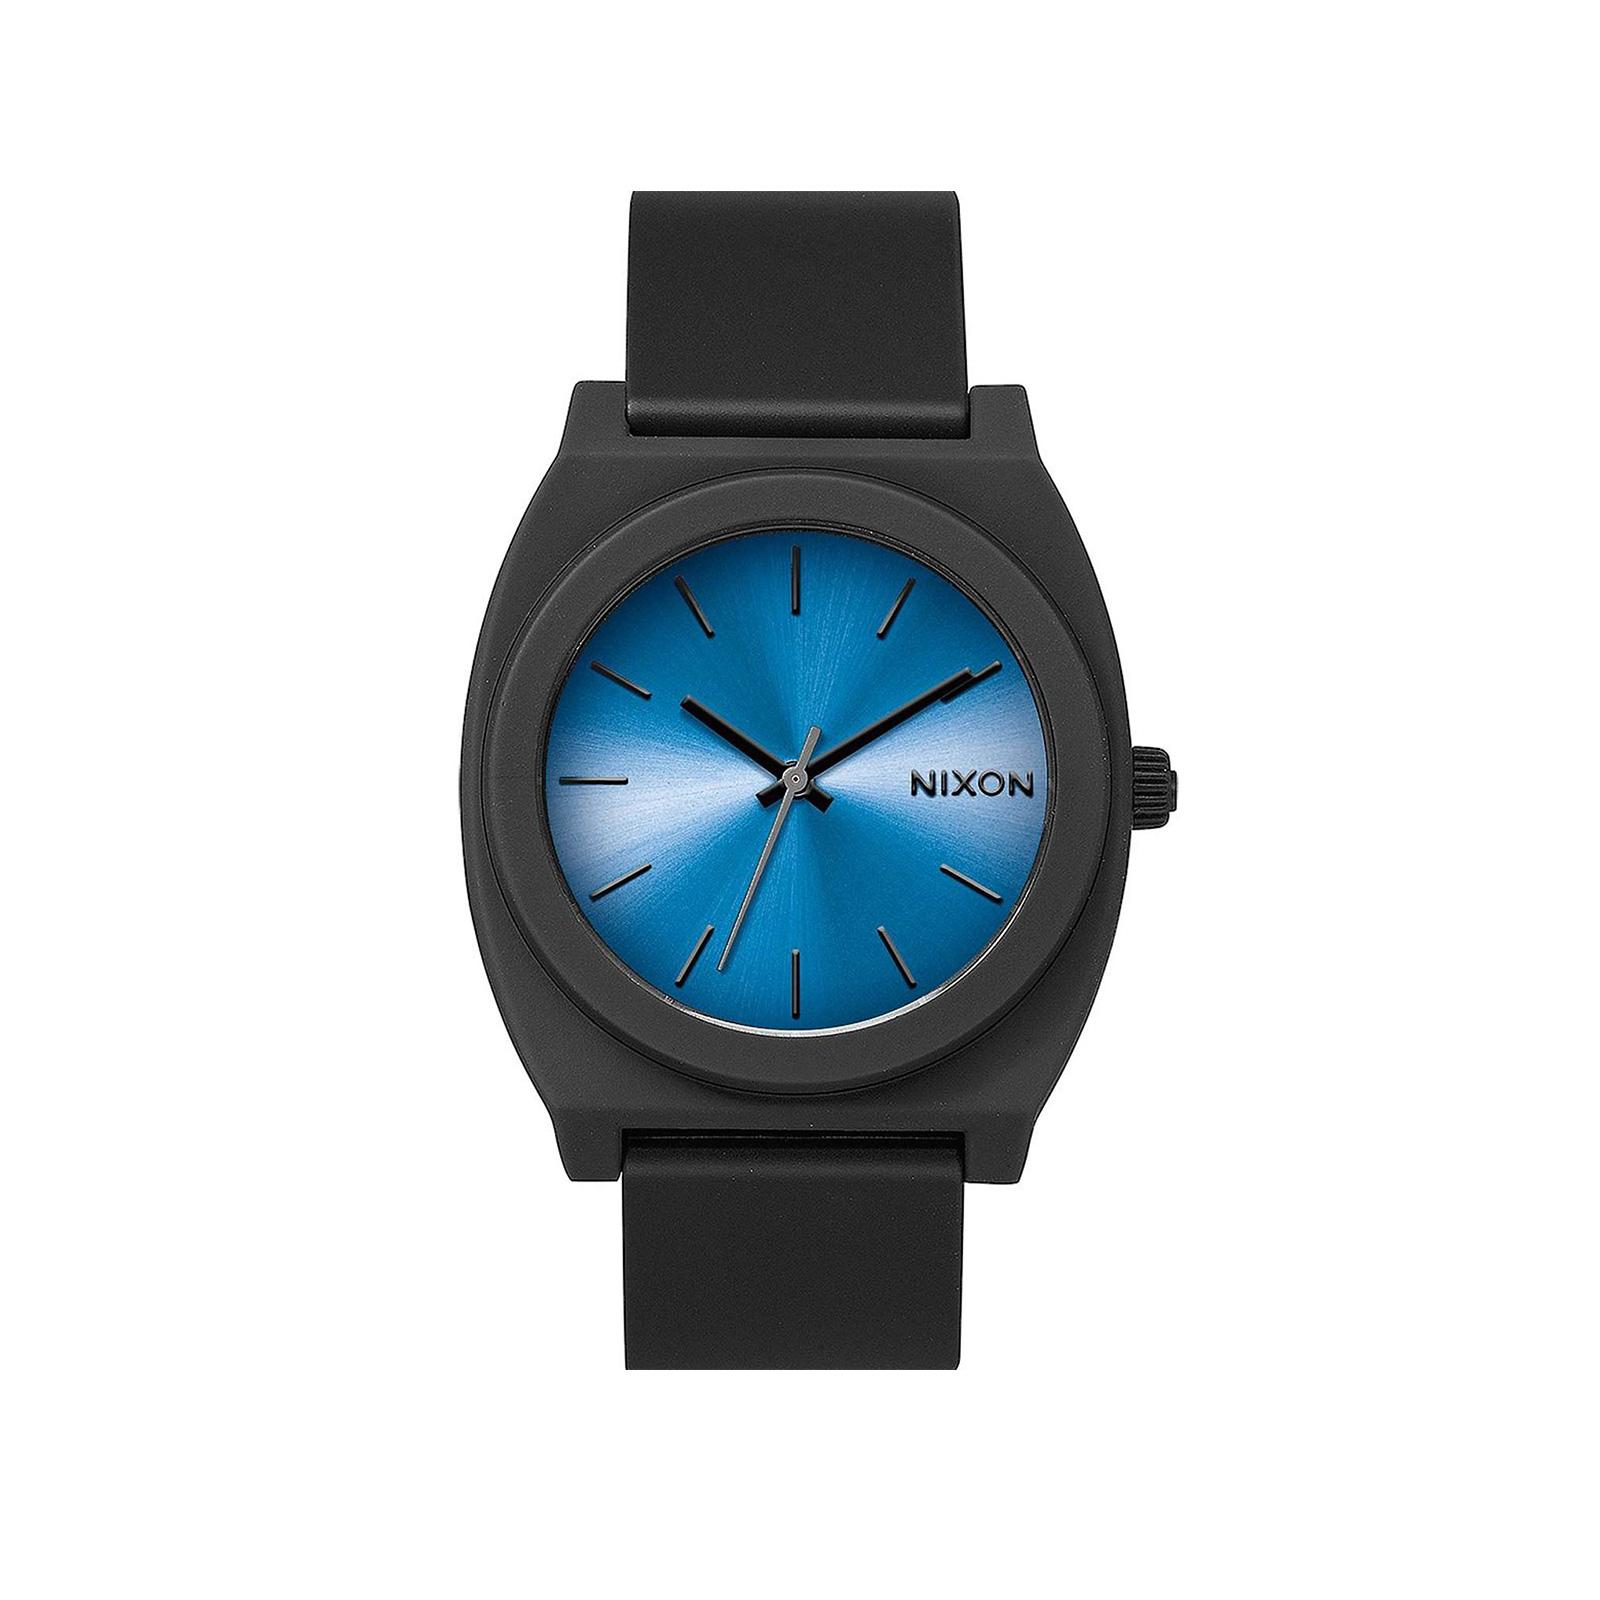 Nixon - NIXON TIME TELLER P - ΑΝΘΡΑΚΙ